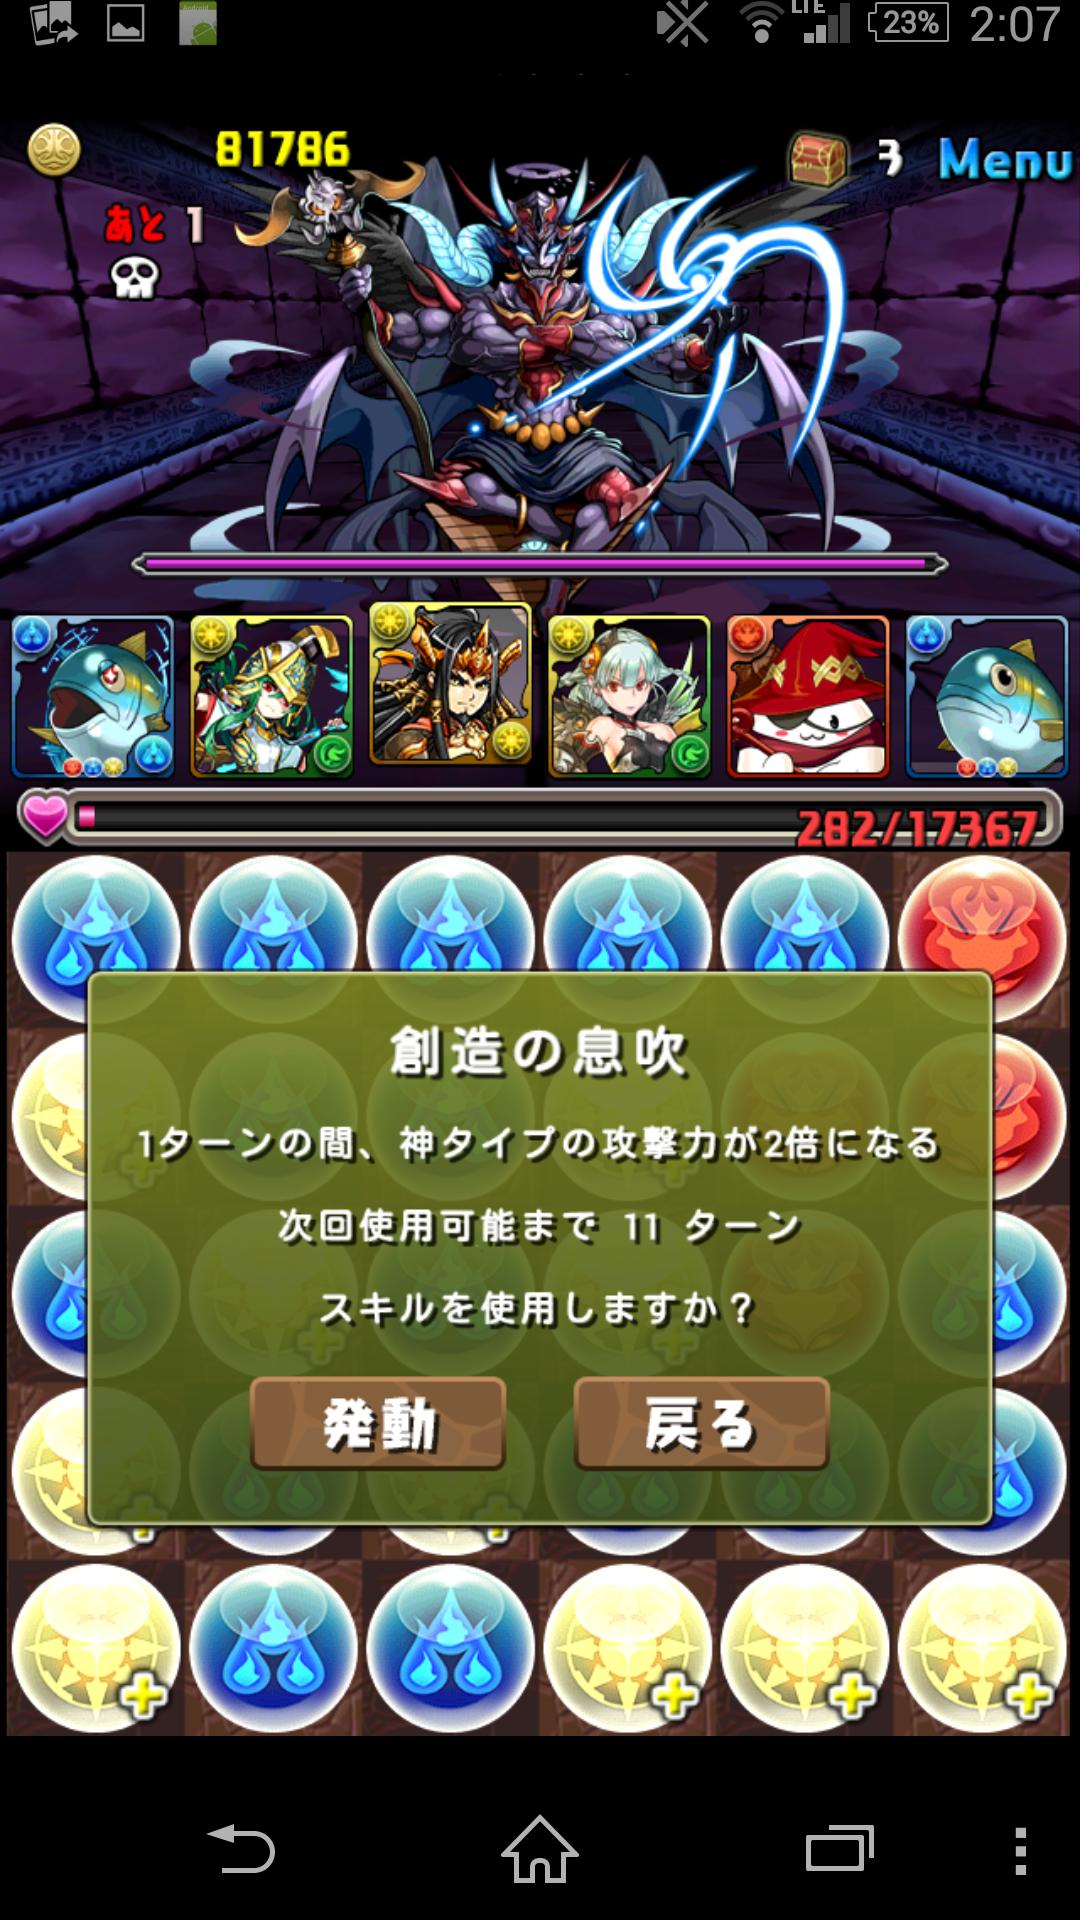 Screenshot_2014-09-30-02-08-00.png